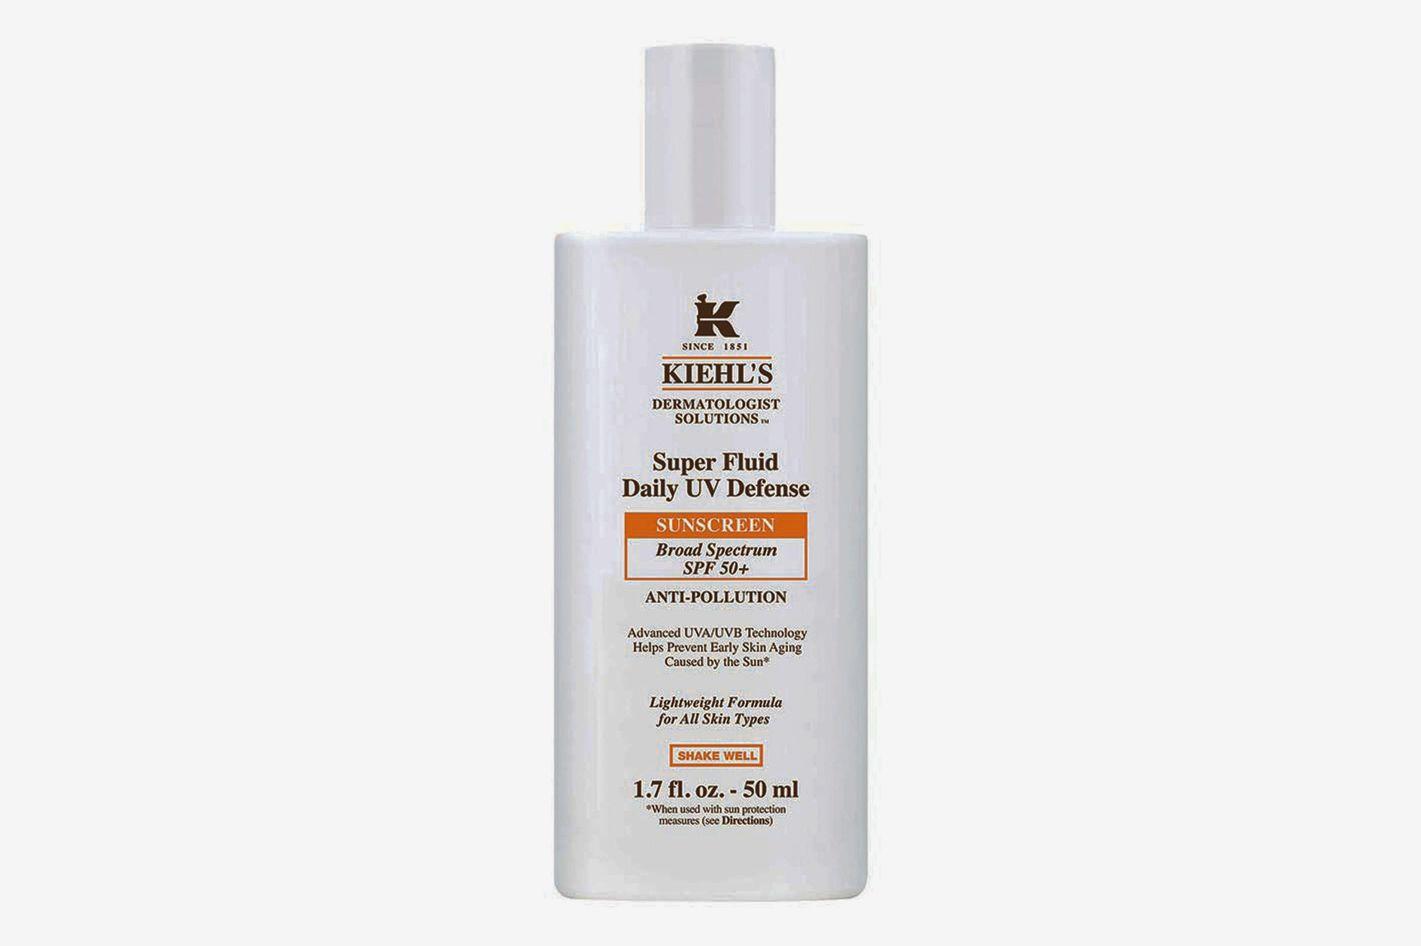 Kiehl's Super Fluid Daily UV Defense Sunscreen Broad Spectrum